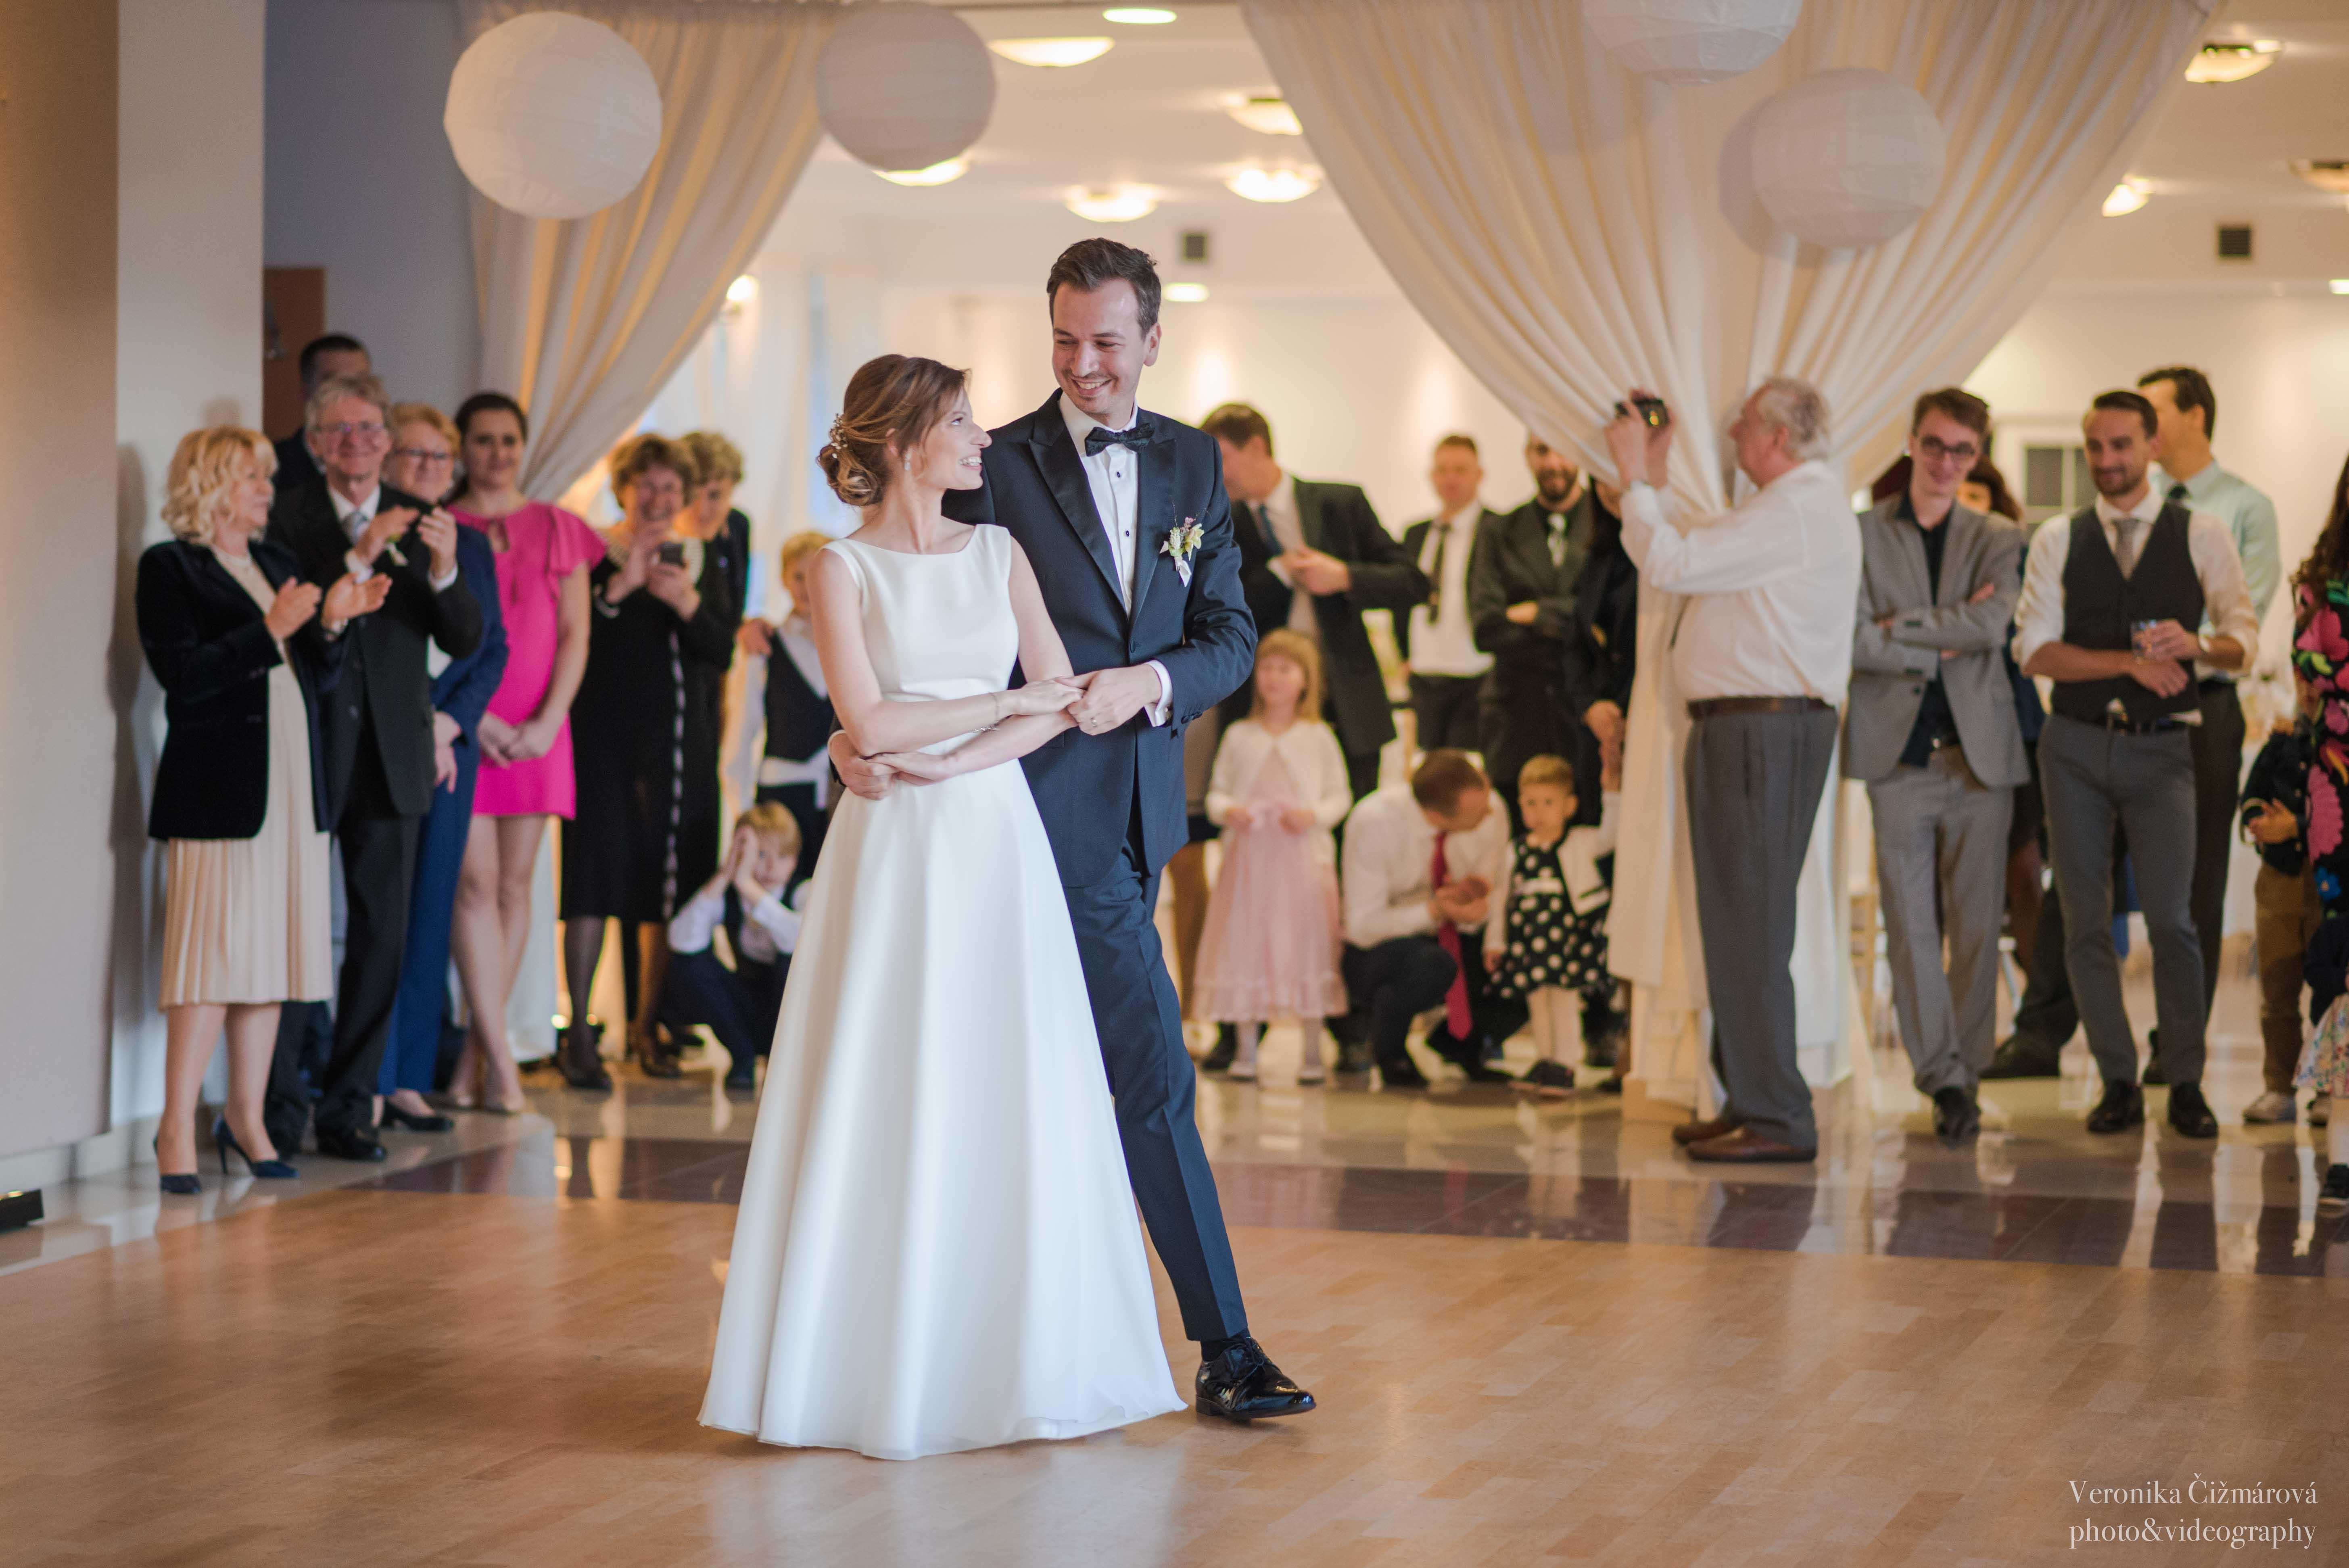 svadba mladomanzelia bratislava pri bratislavejpg